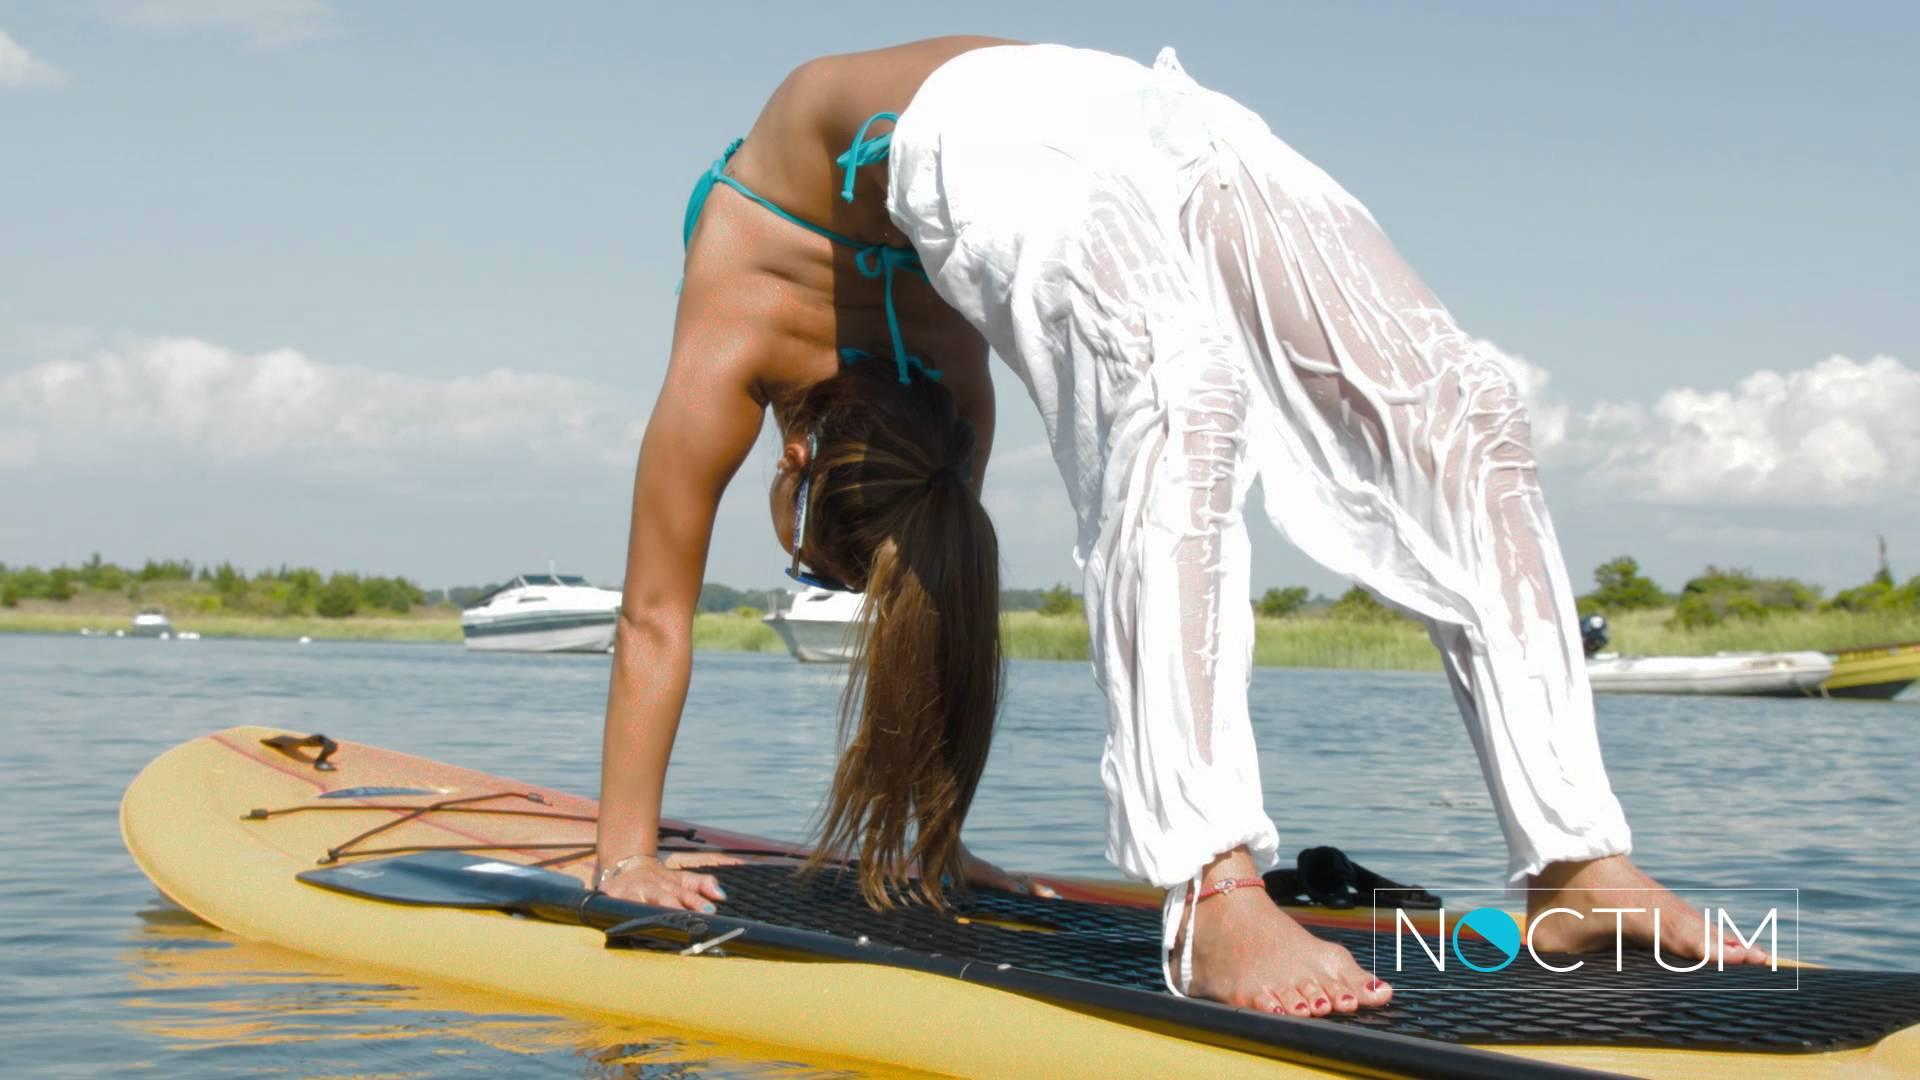 NOCTUM | Paddle Board Yogi